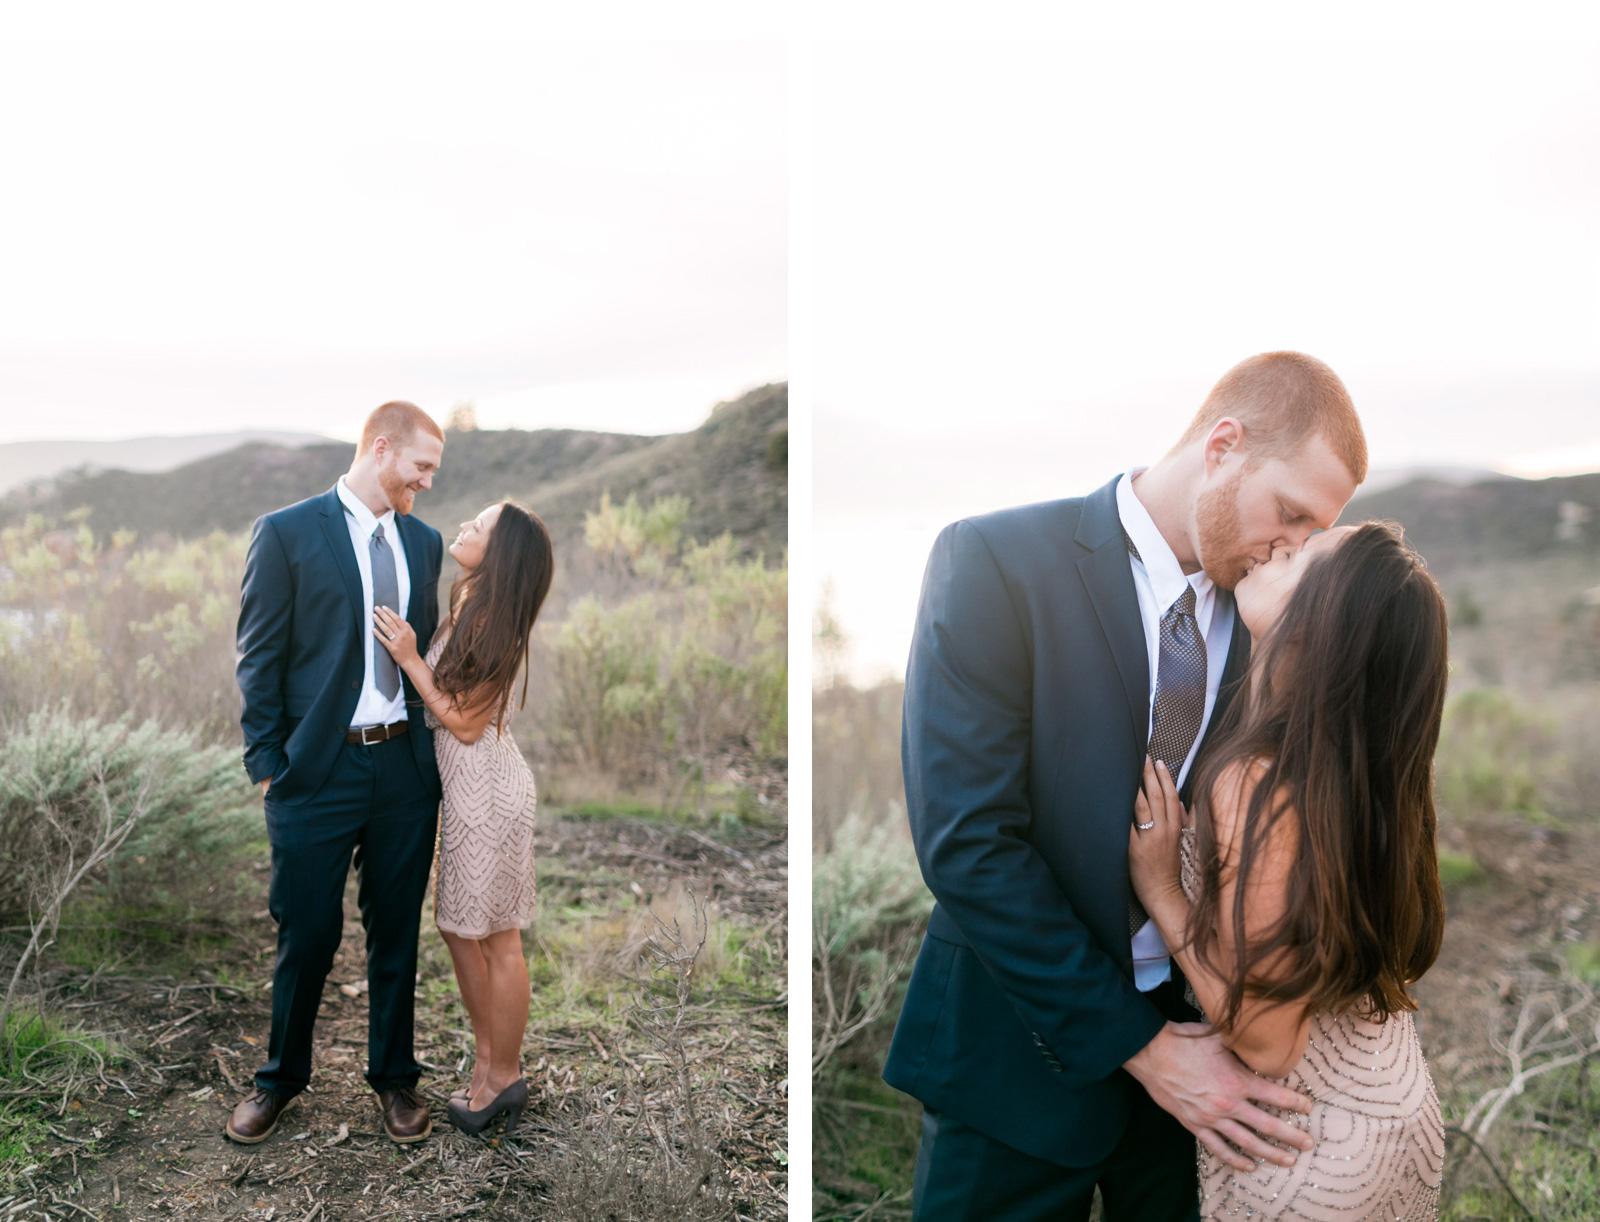 Central-Coast-Wedding-Photographer-Natalie-Schutt-Photography_08.jpg